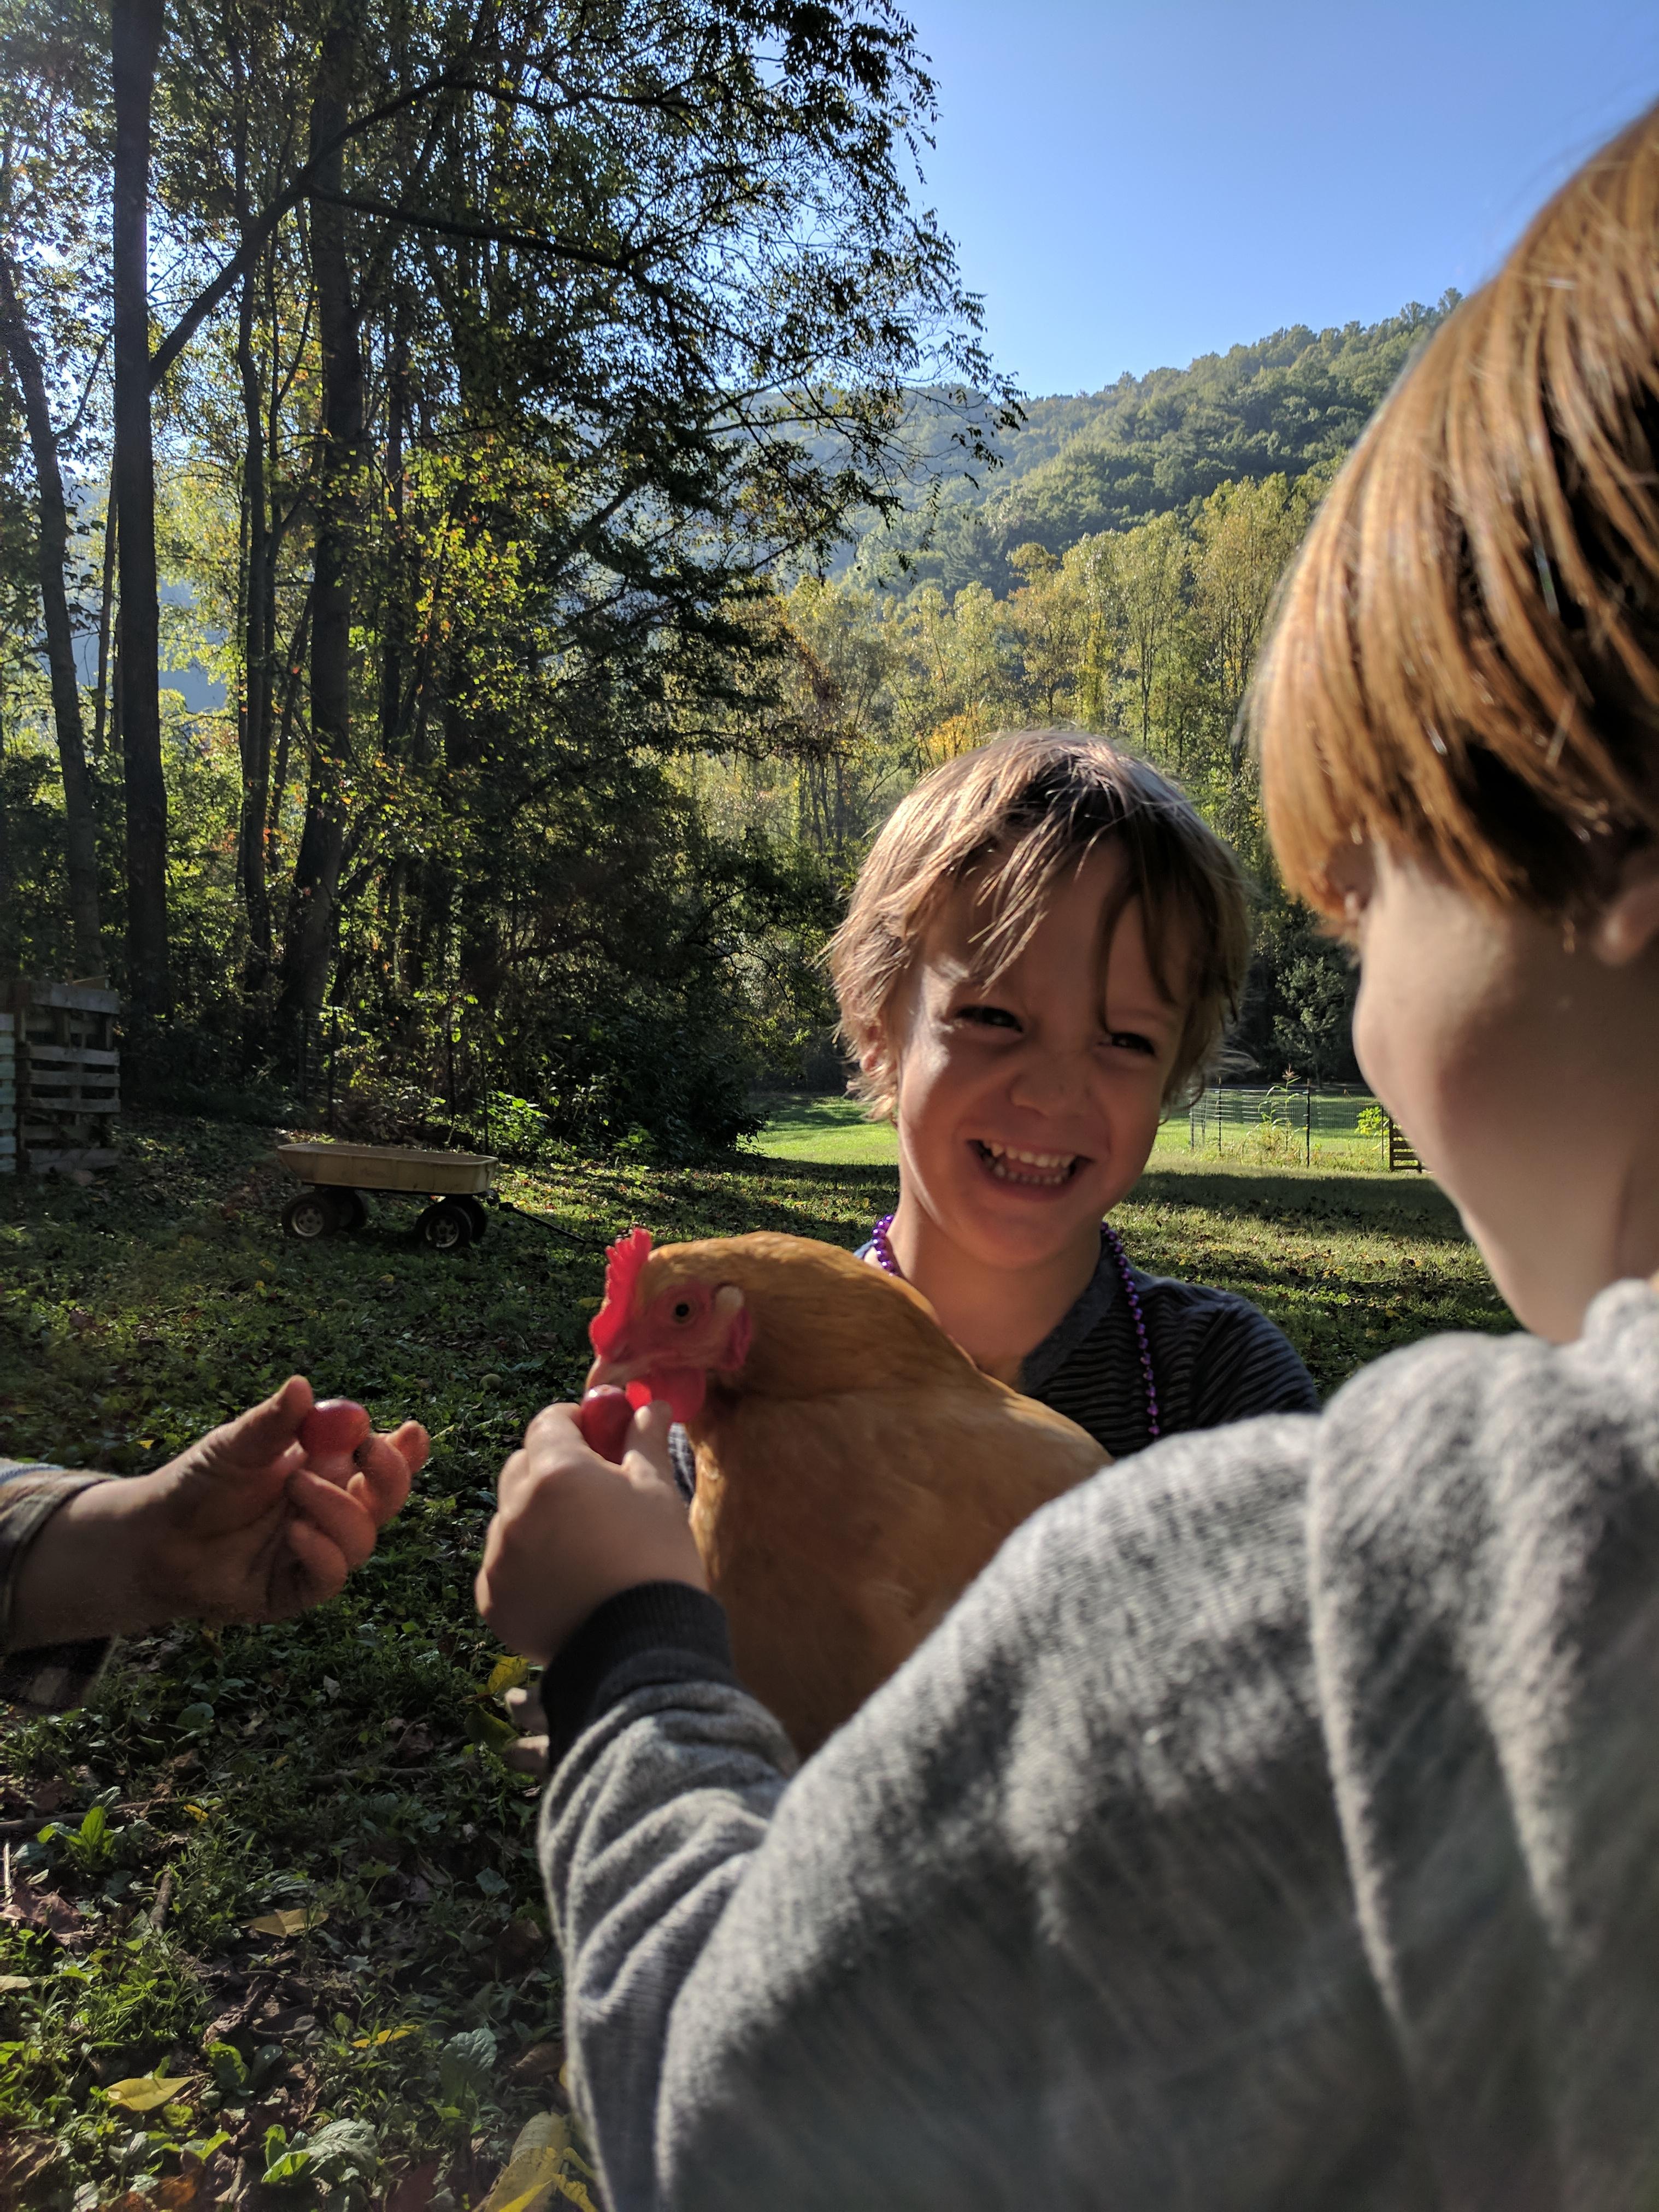 Ashevillefarmstead-kids-chickens-sprouts